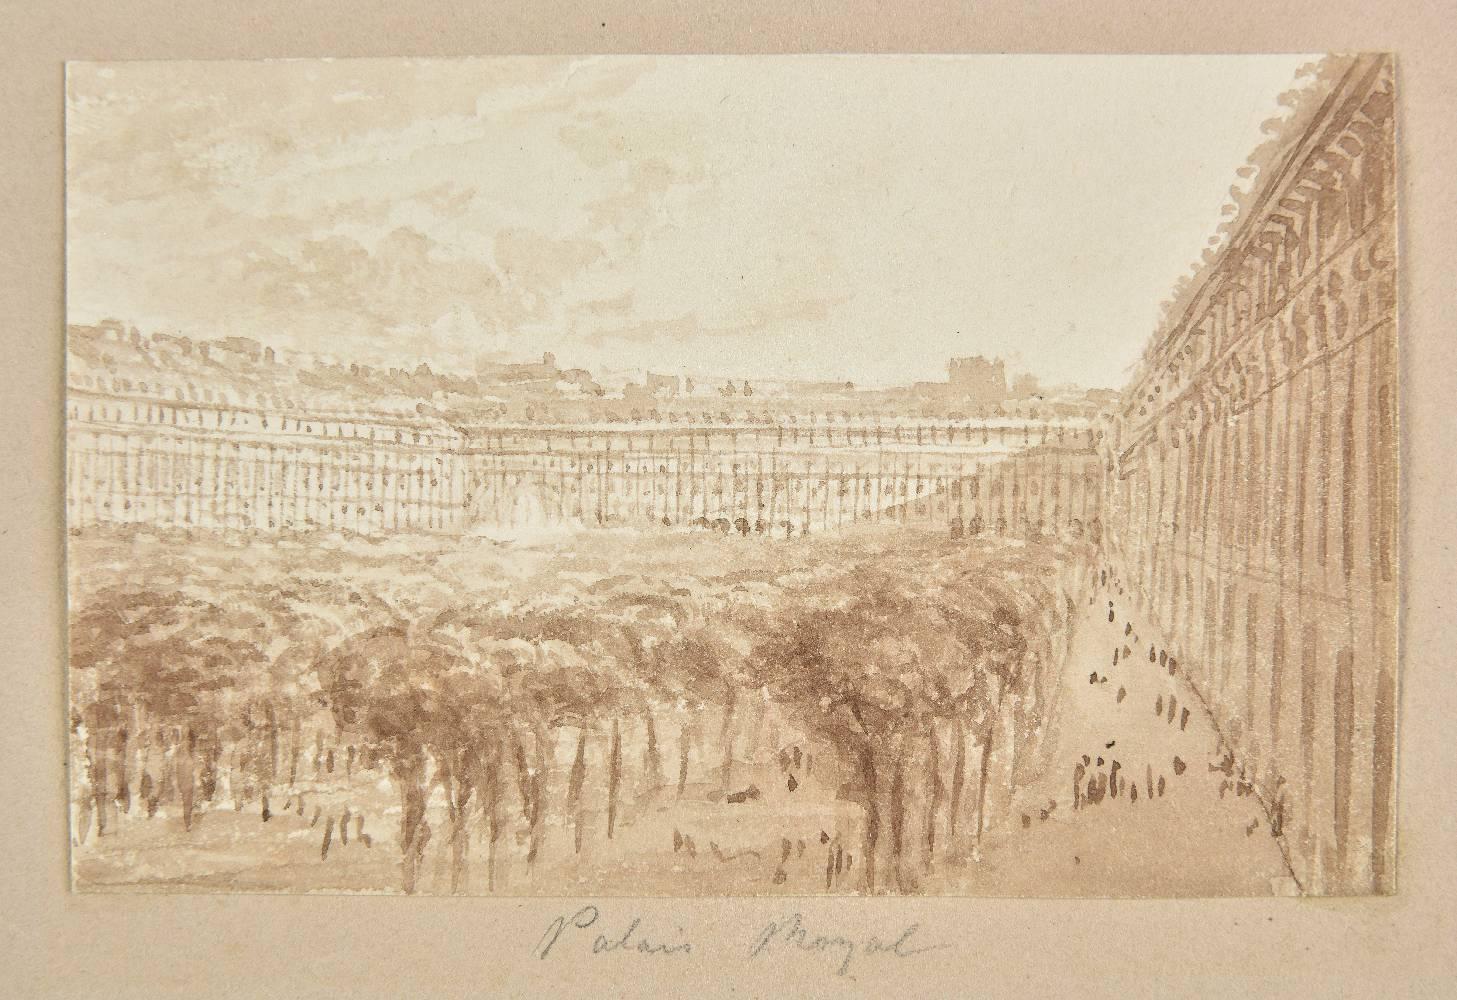 Lot 56 - *Batty (Robert, 1789-1848). Palais Royal, Paris, pen, brown ink and brown wash on paper, 68 x 107 mm